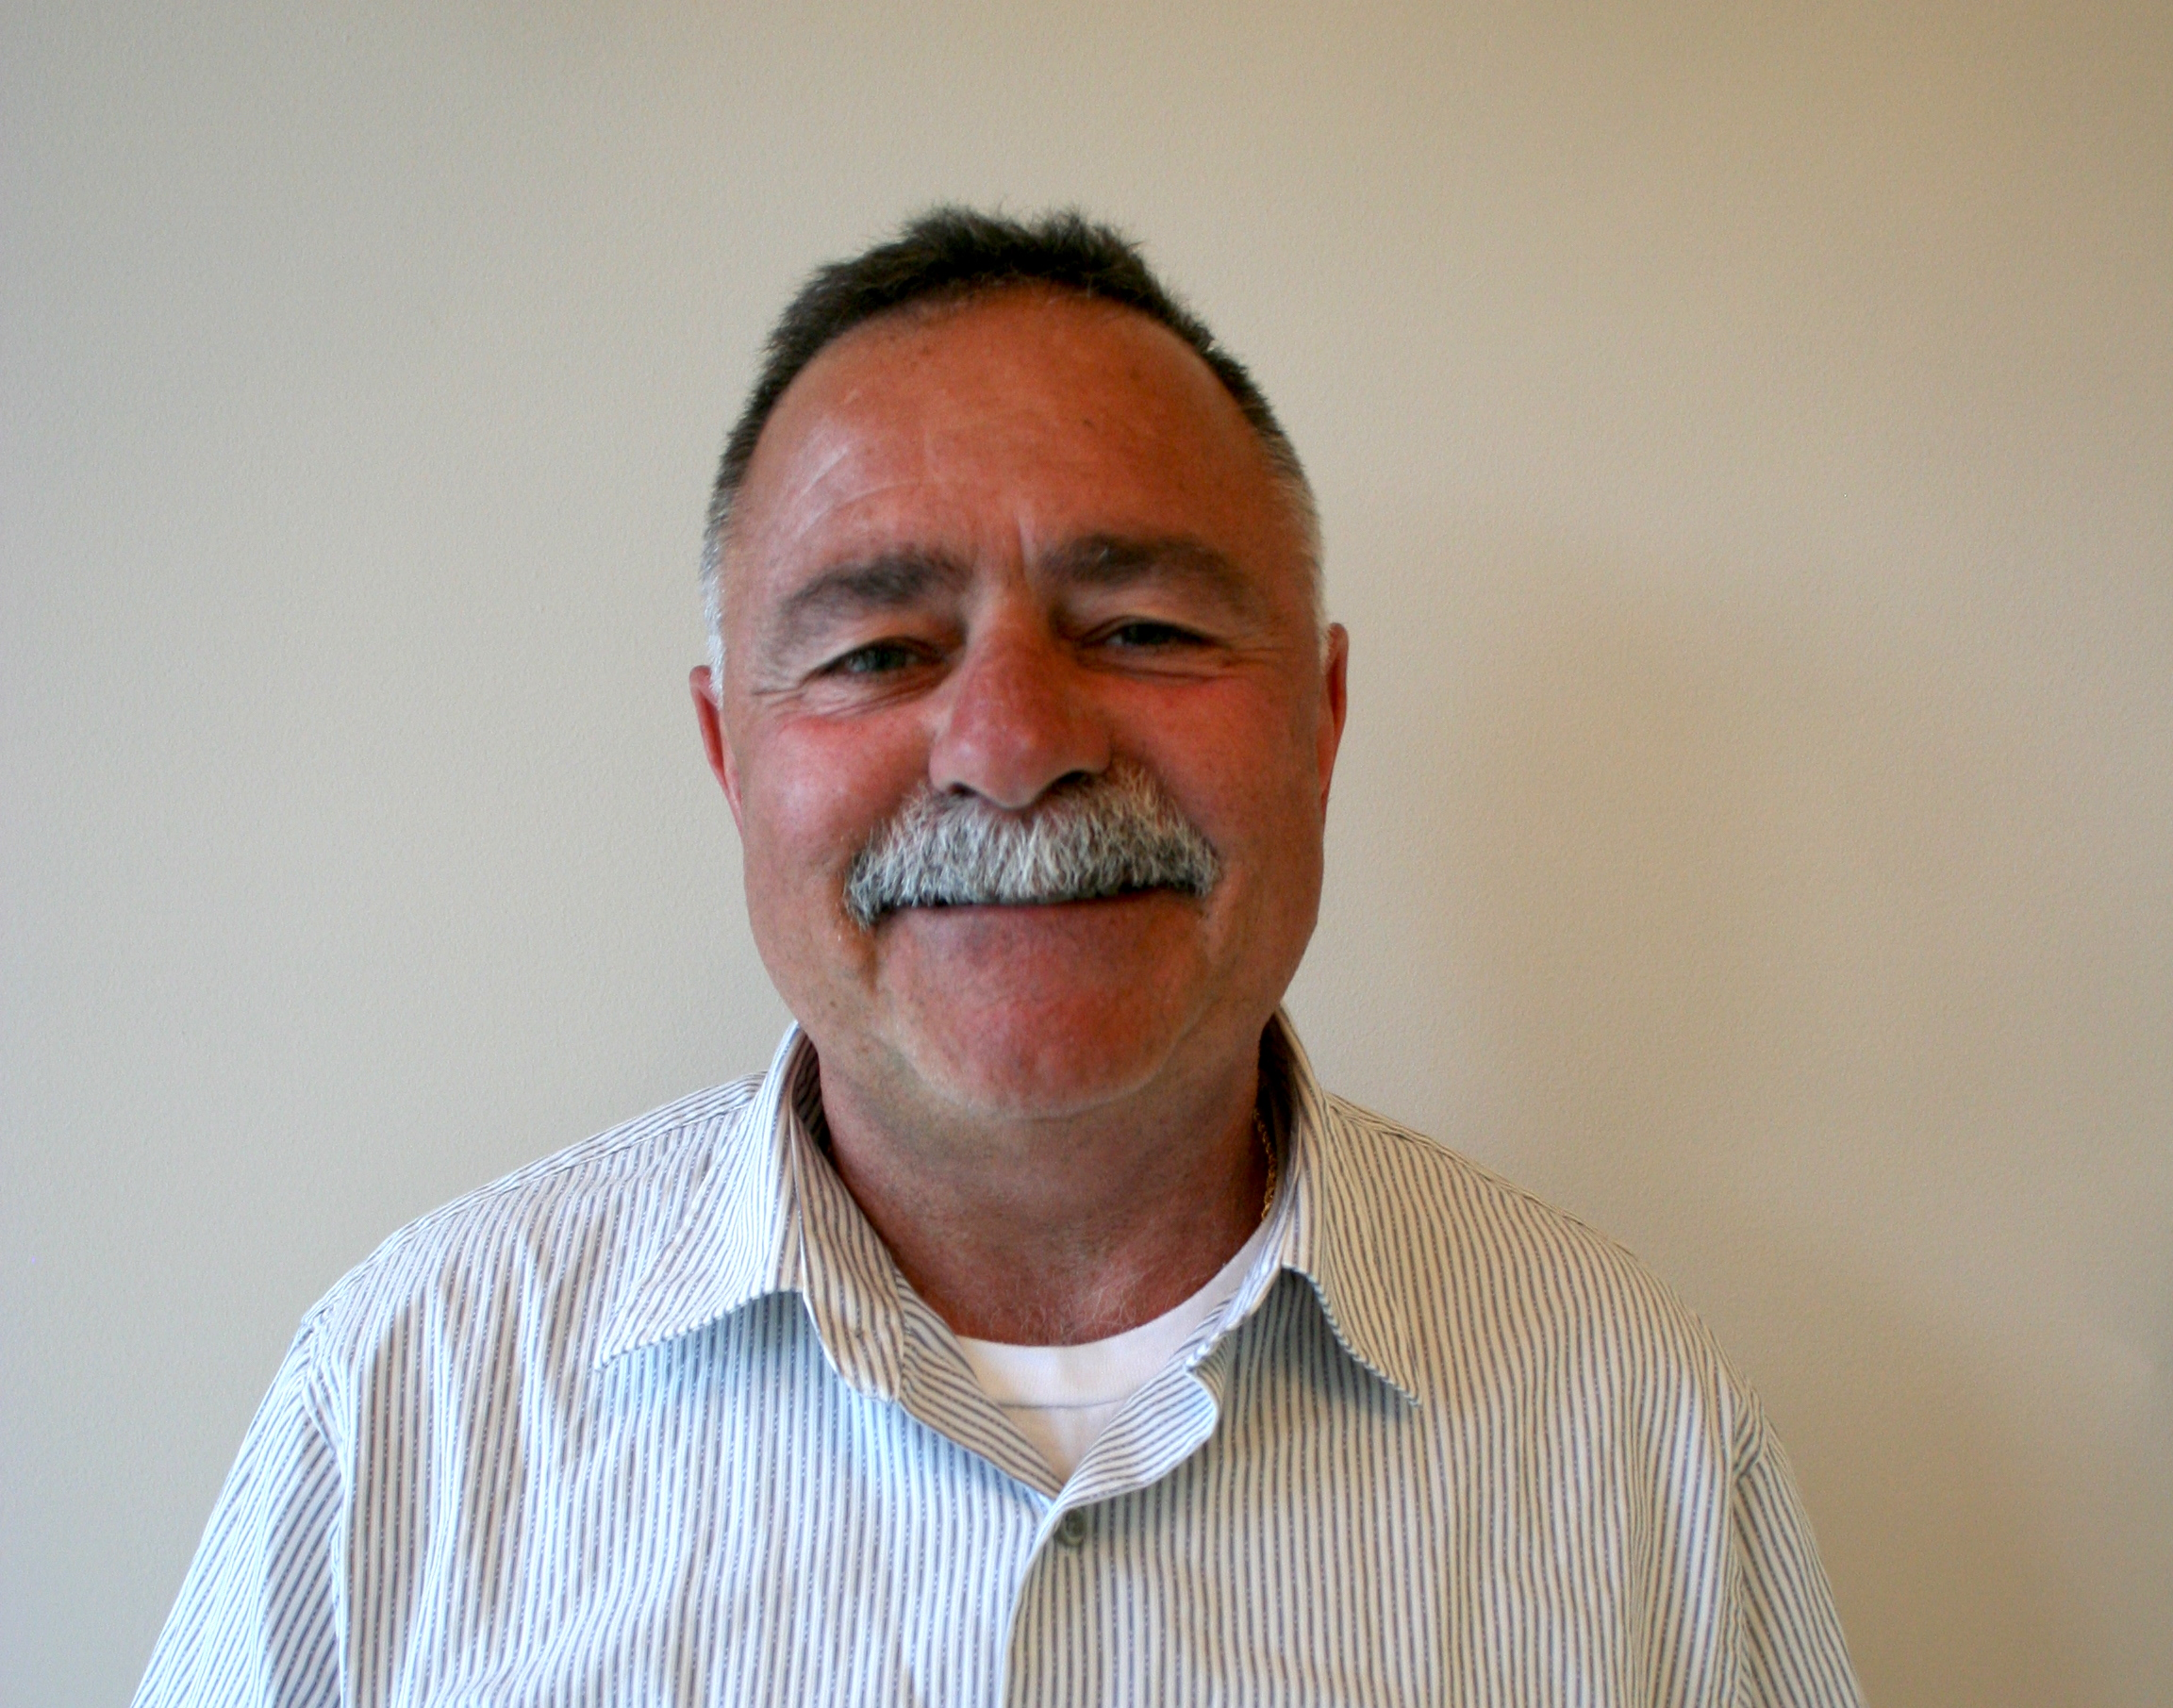 Steve Maneri is Millville's new mayor.